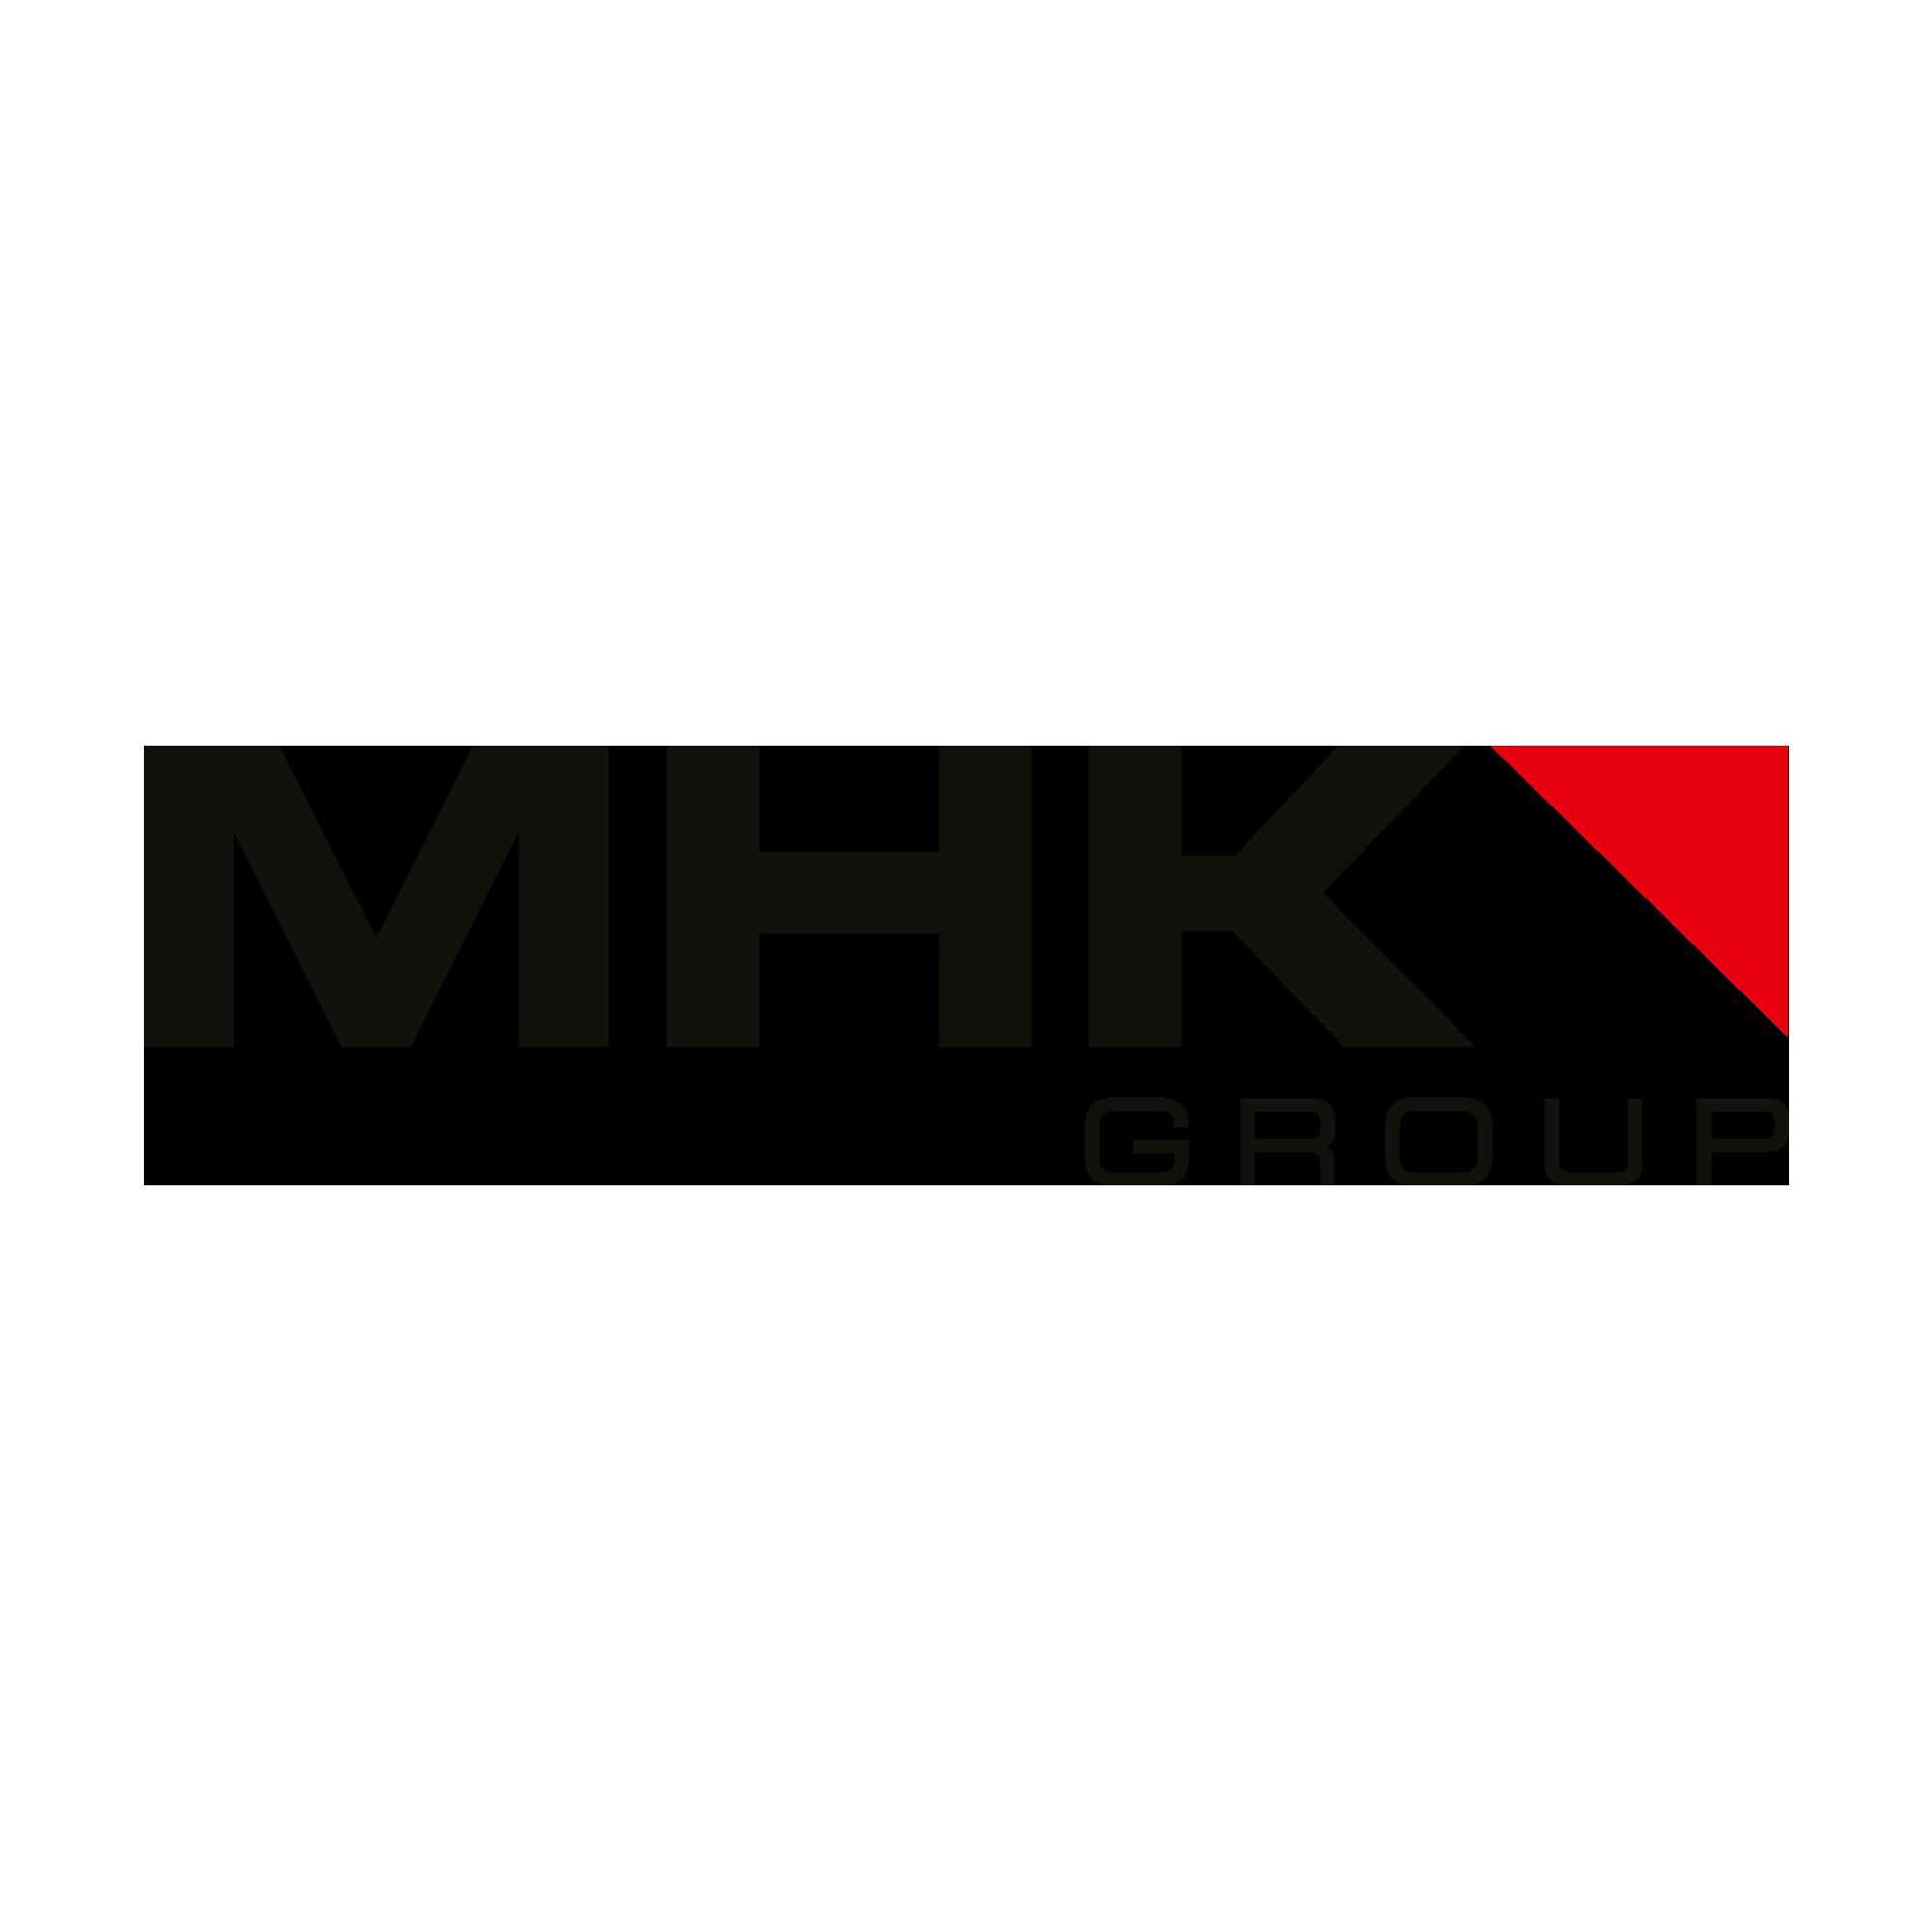 MHK Marketing Handel Kooperation GmbH & Co. Verbundgruppen Holding KG